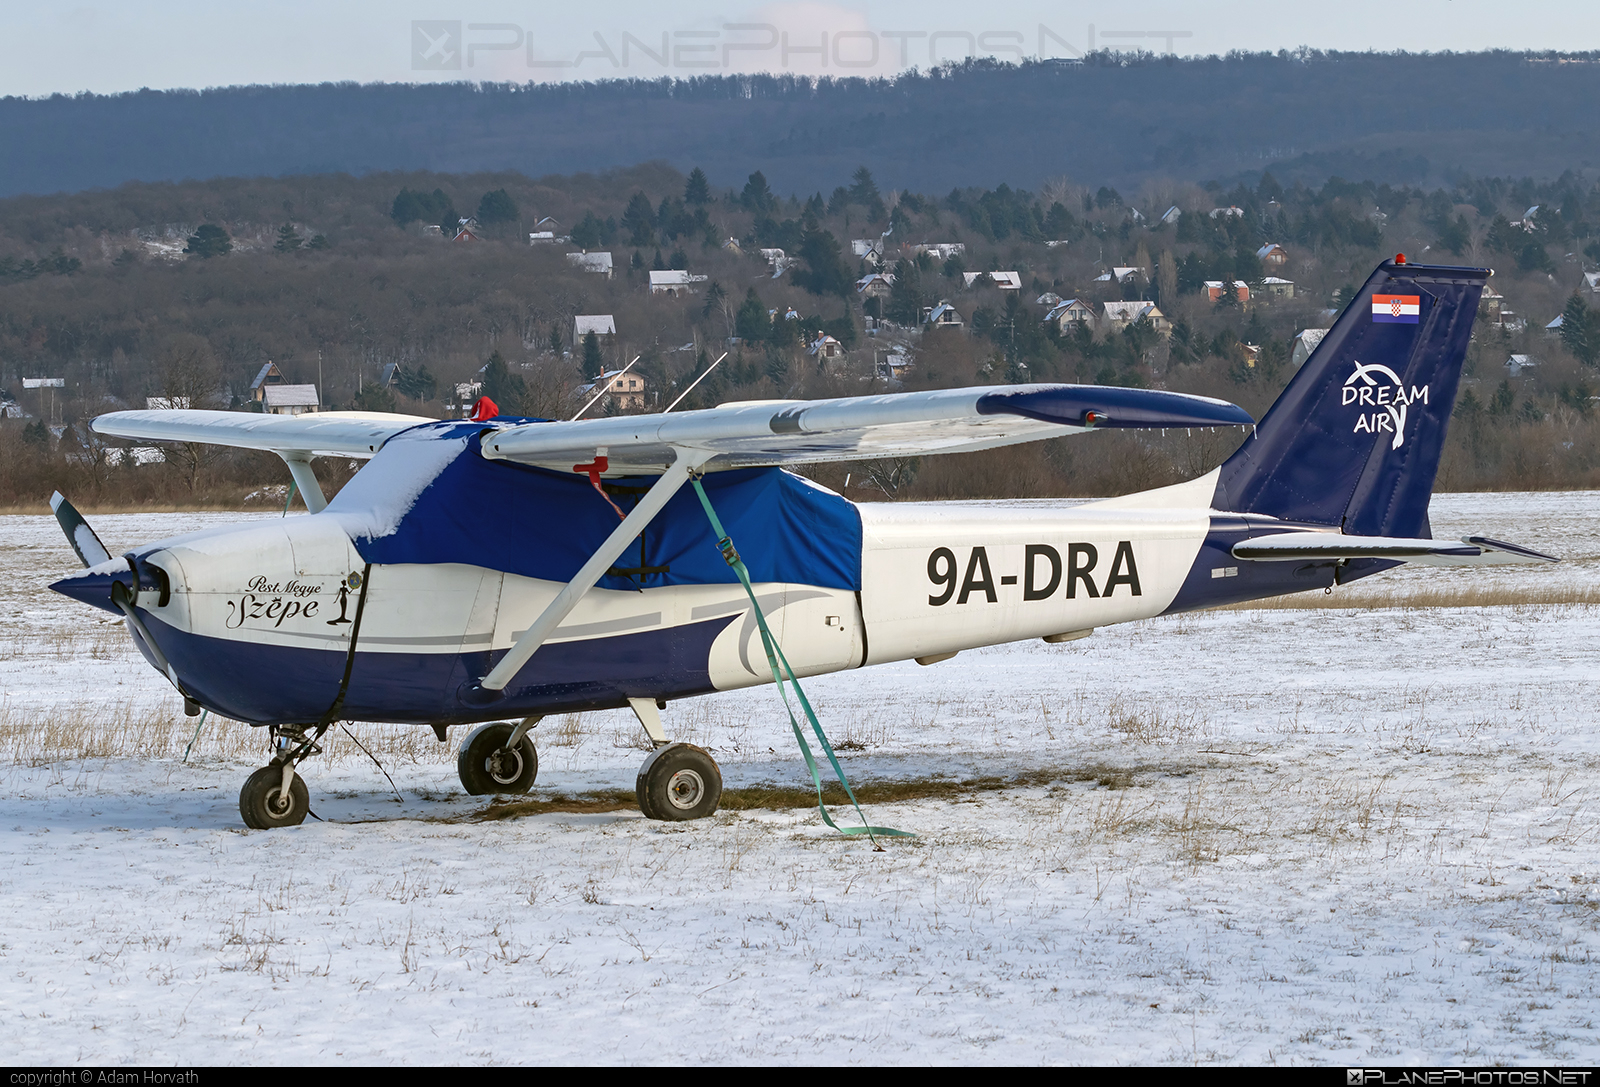 Cessna 172K Skyhawk - 9A-DRA operated by Dream Air Kft. #cessna #cessna172 #cessna172k #cessna172kskyhawk #cessna172skyhawk #cessnaskyhawk #dreamairkft